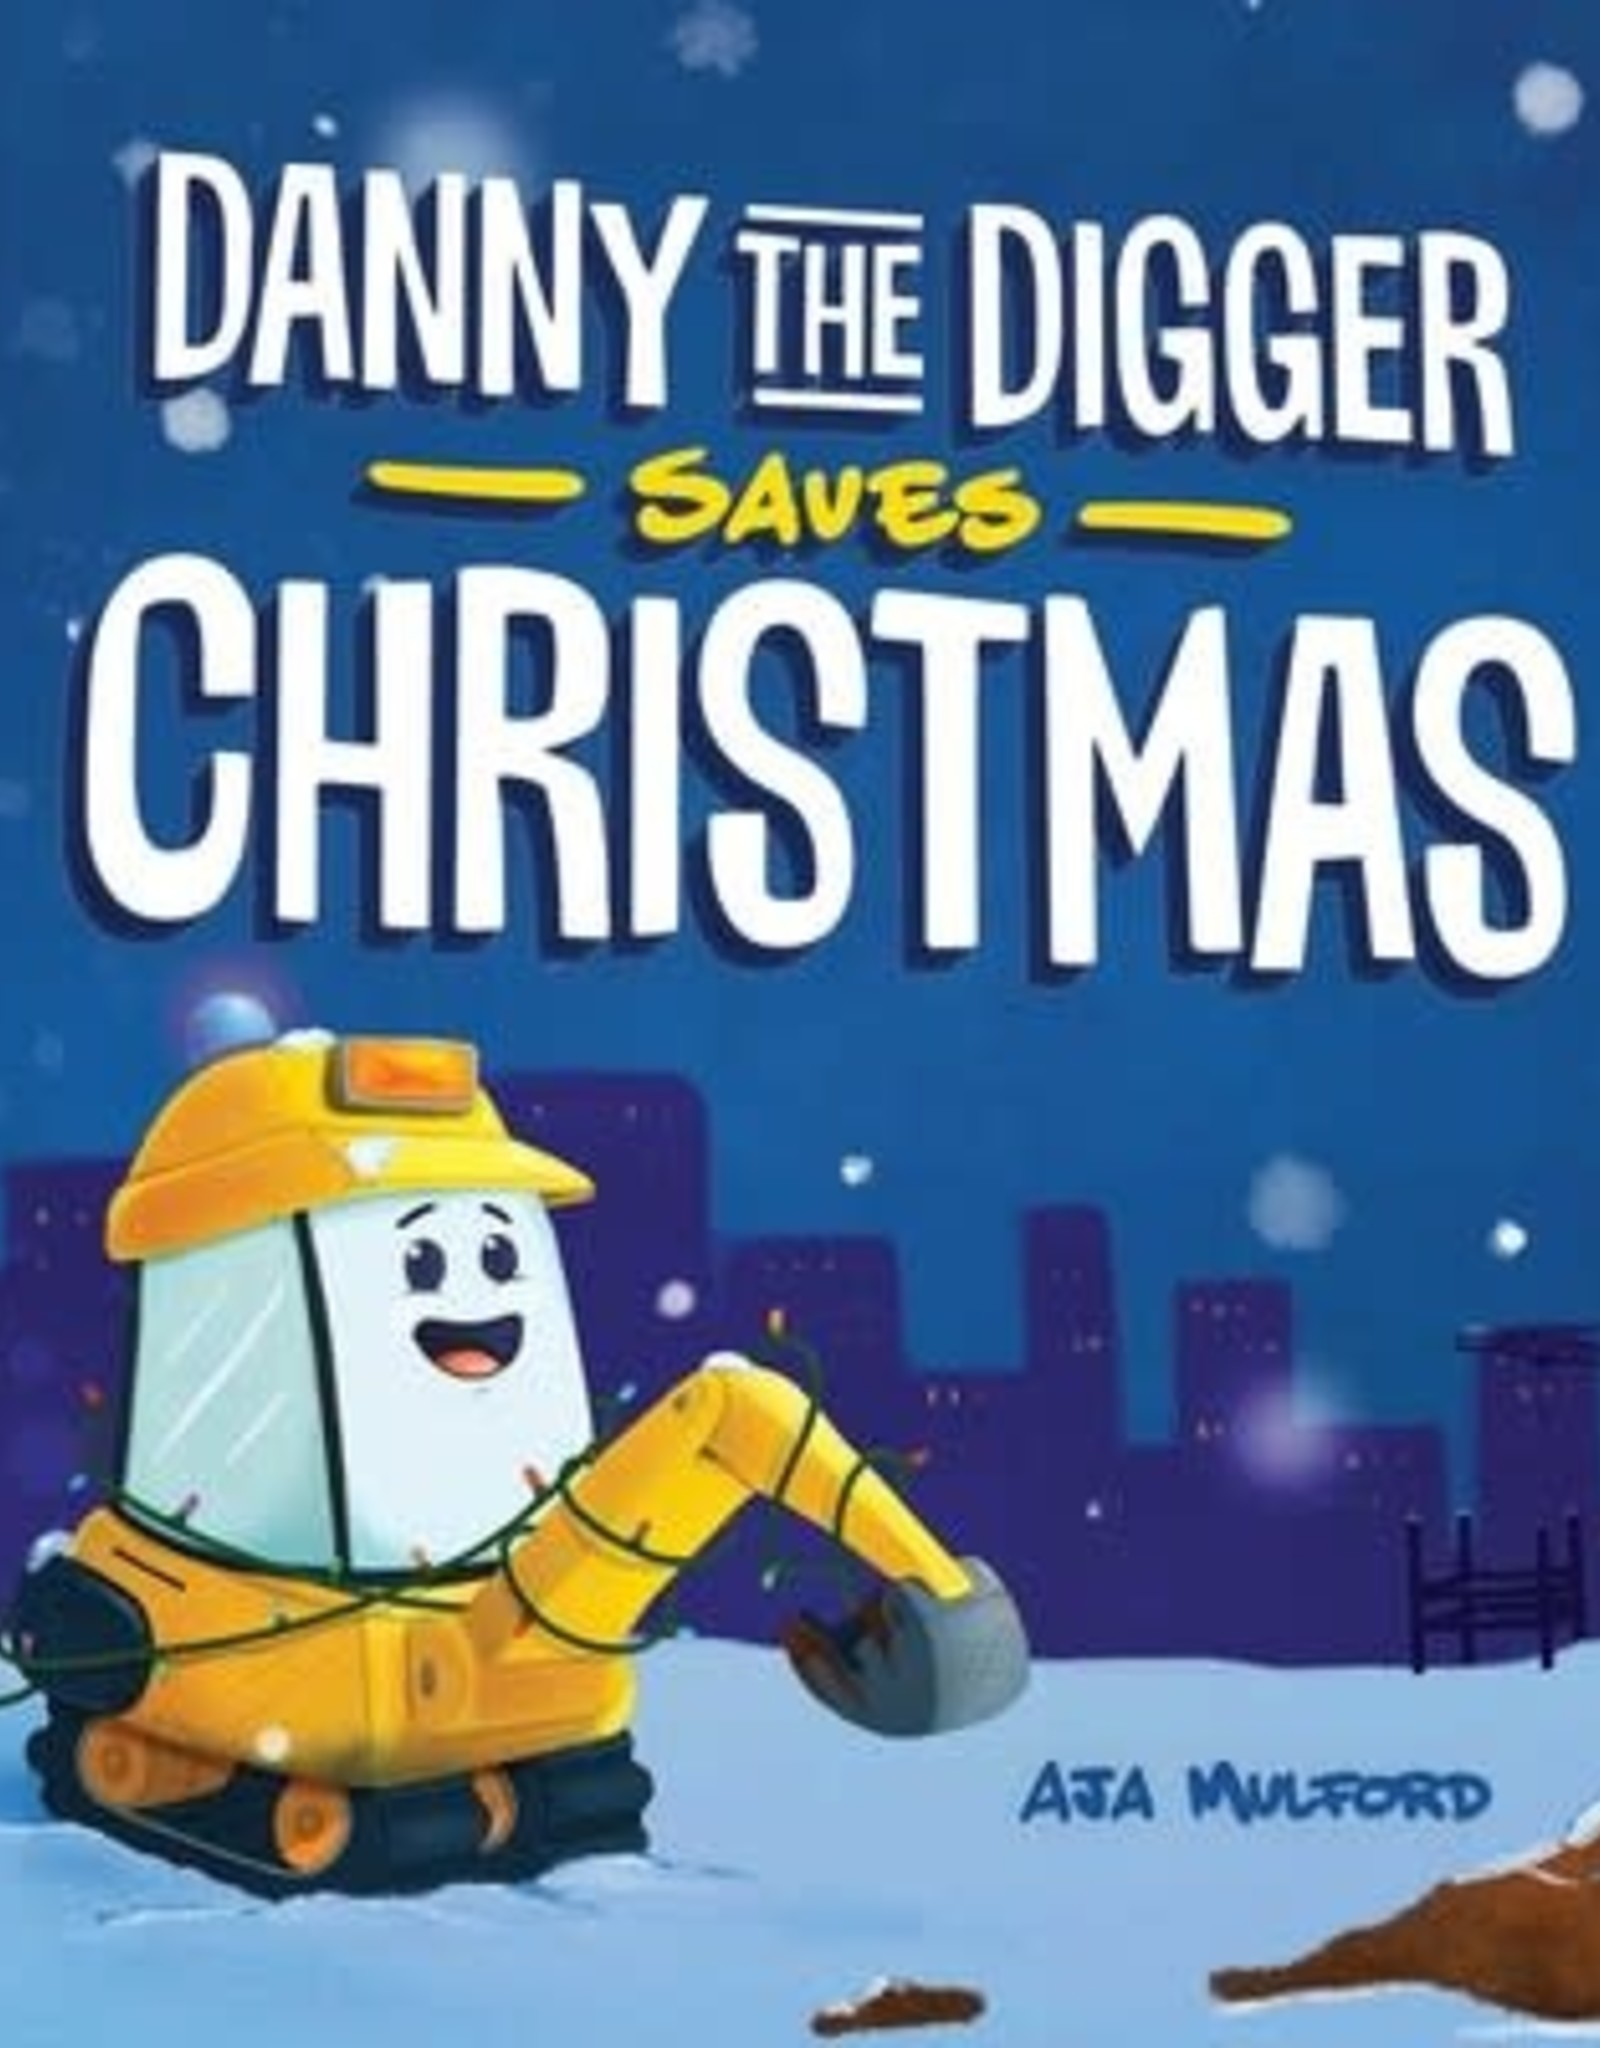 Danny the Digger Saves Christmas